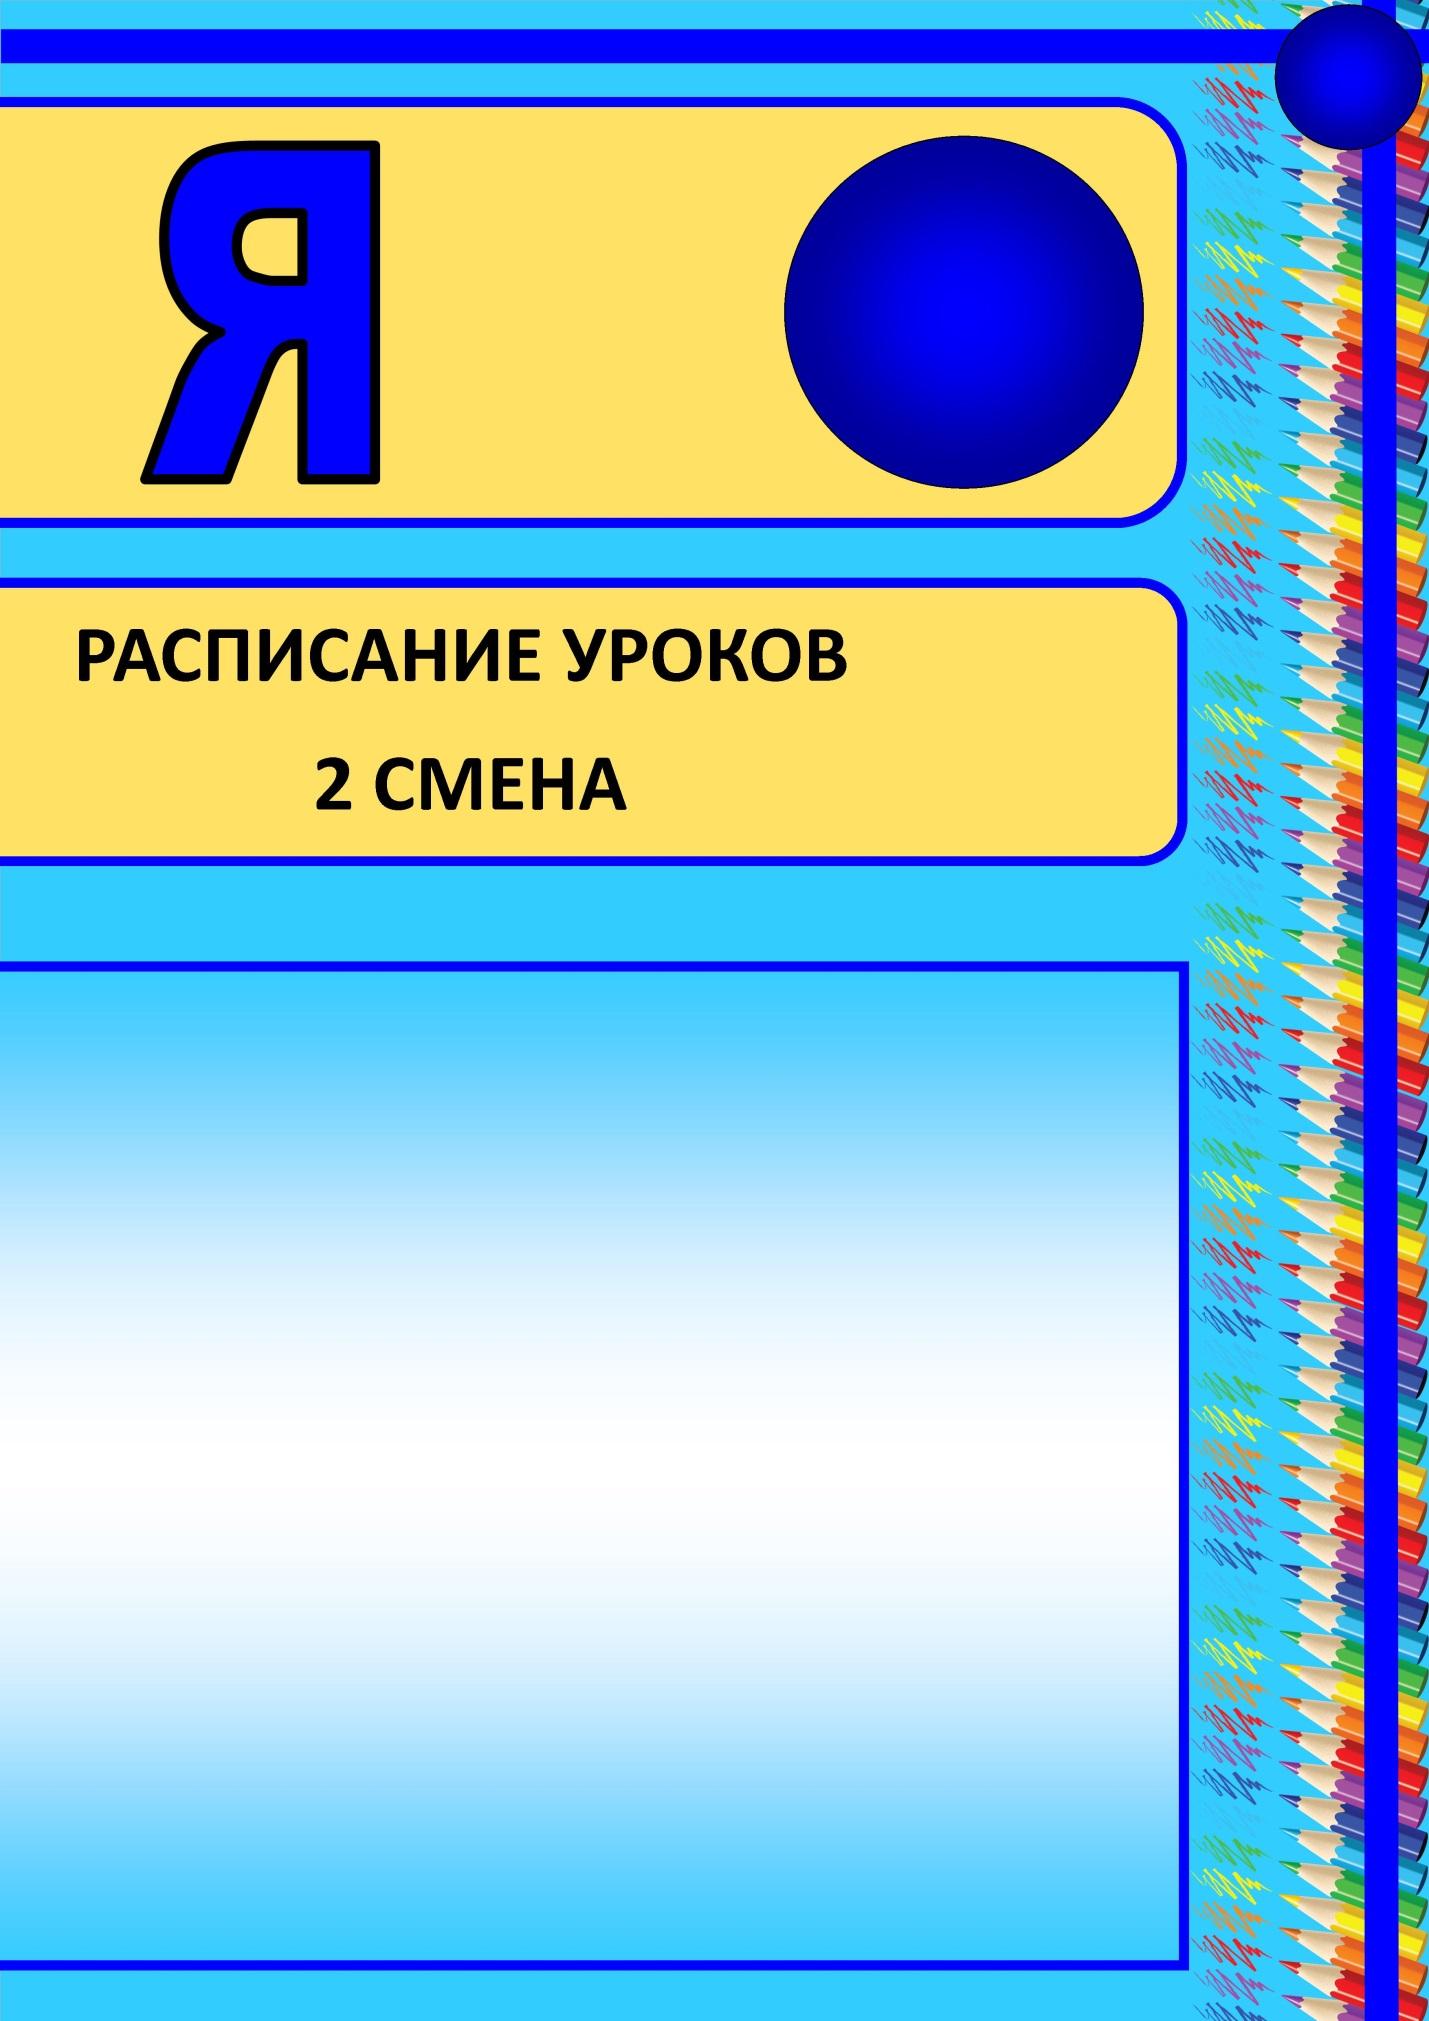 hello_html_177c8ae3.jpg